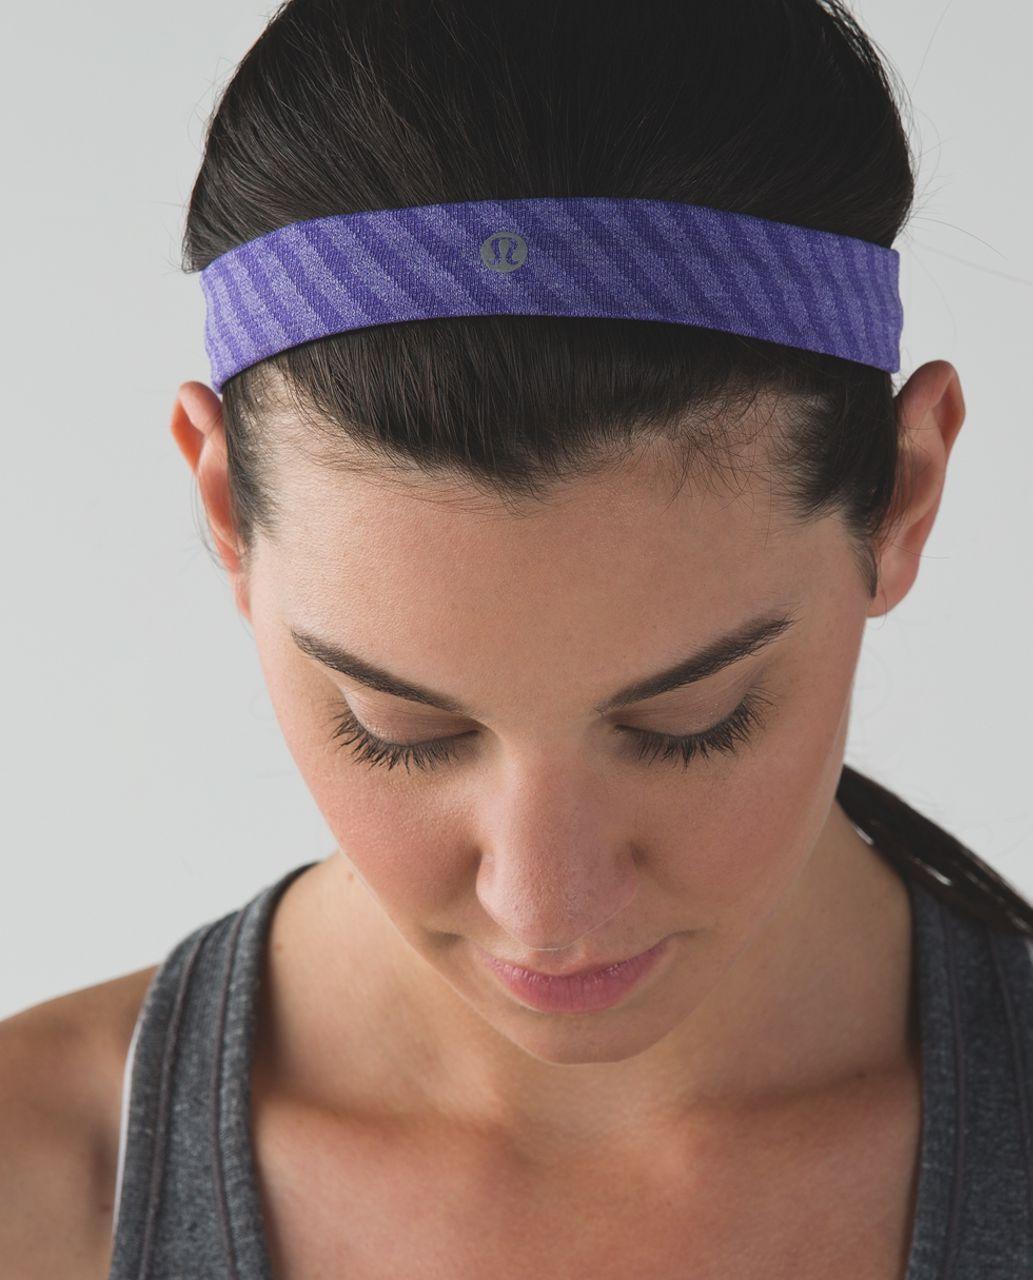 Lululemon Cardio Cross Trainer Headband - Heathered Iris Flower